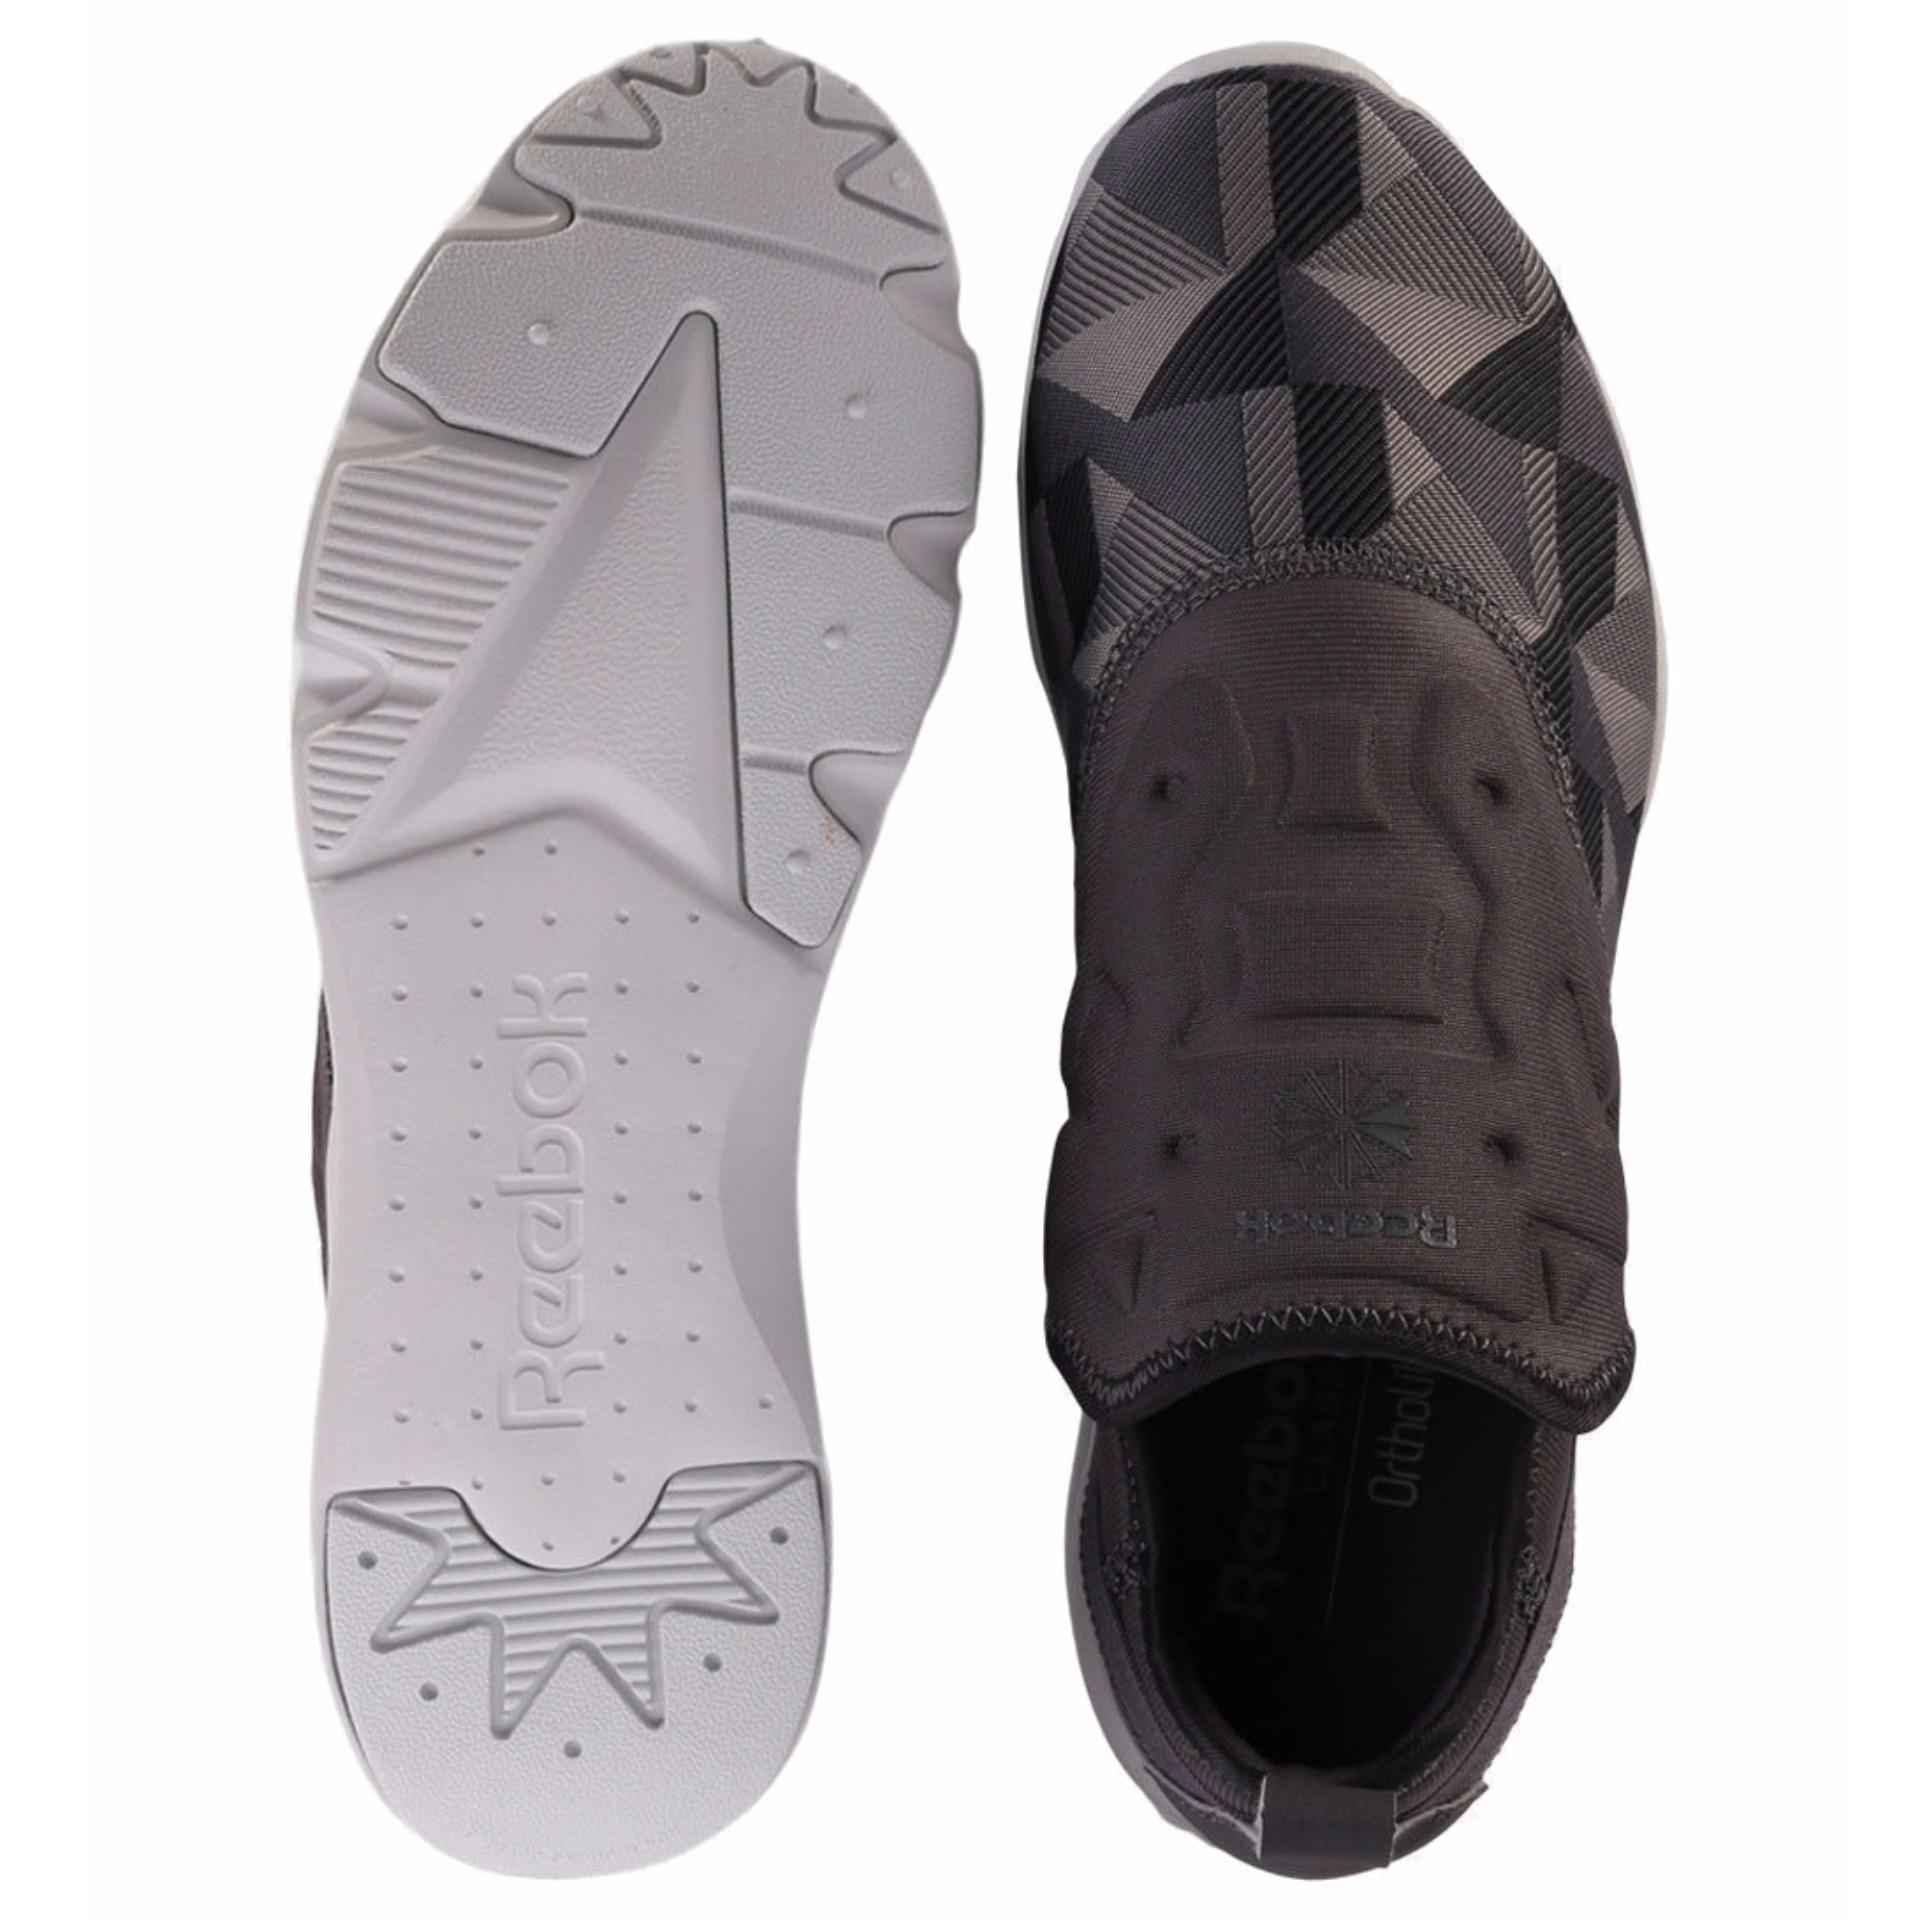 Harga Penawaran Reebok Furylite Slip-On Arch - Sepatu Pria - Abu-abu ... b2413c9231